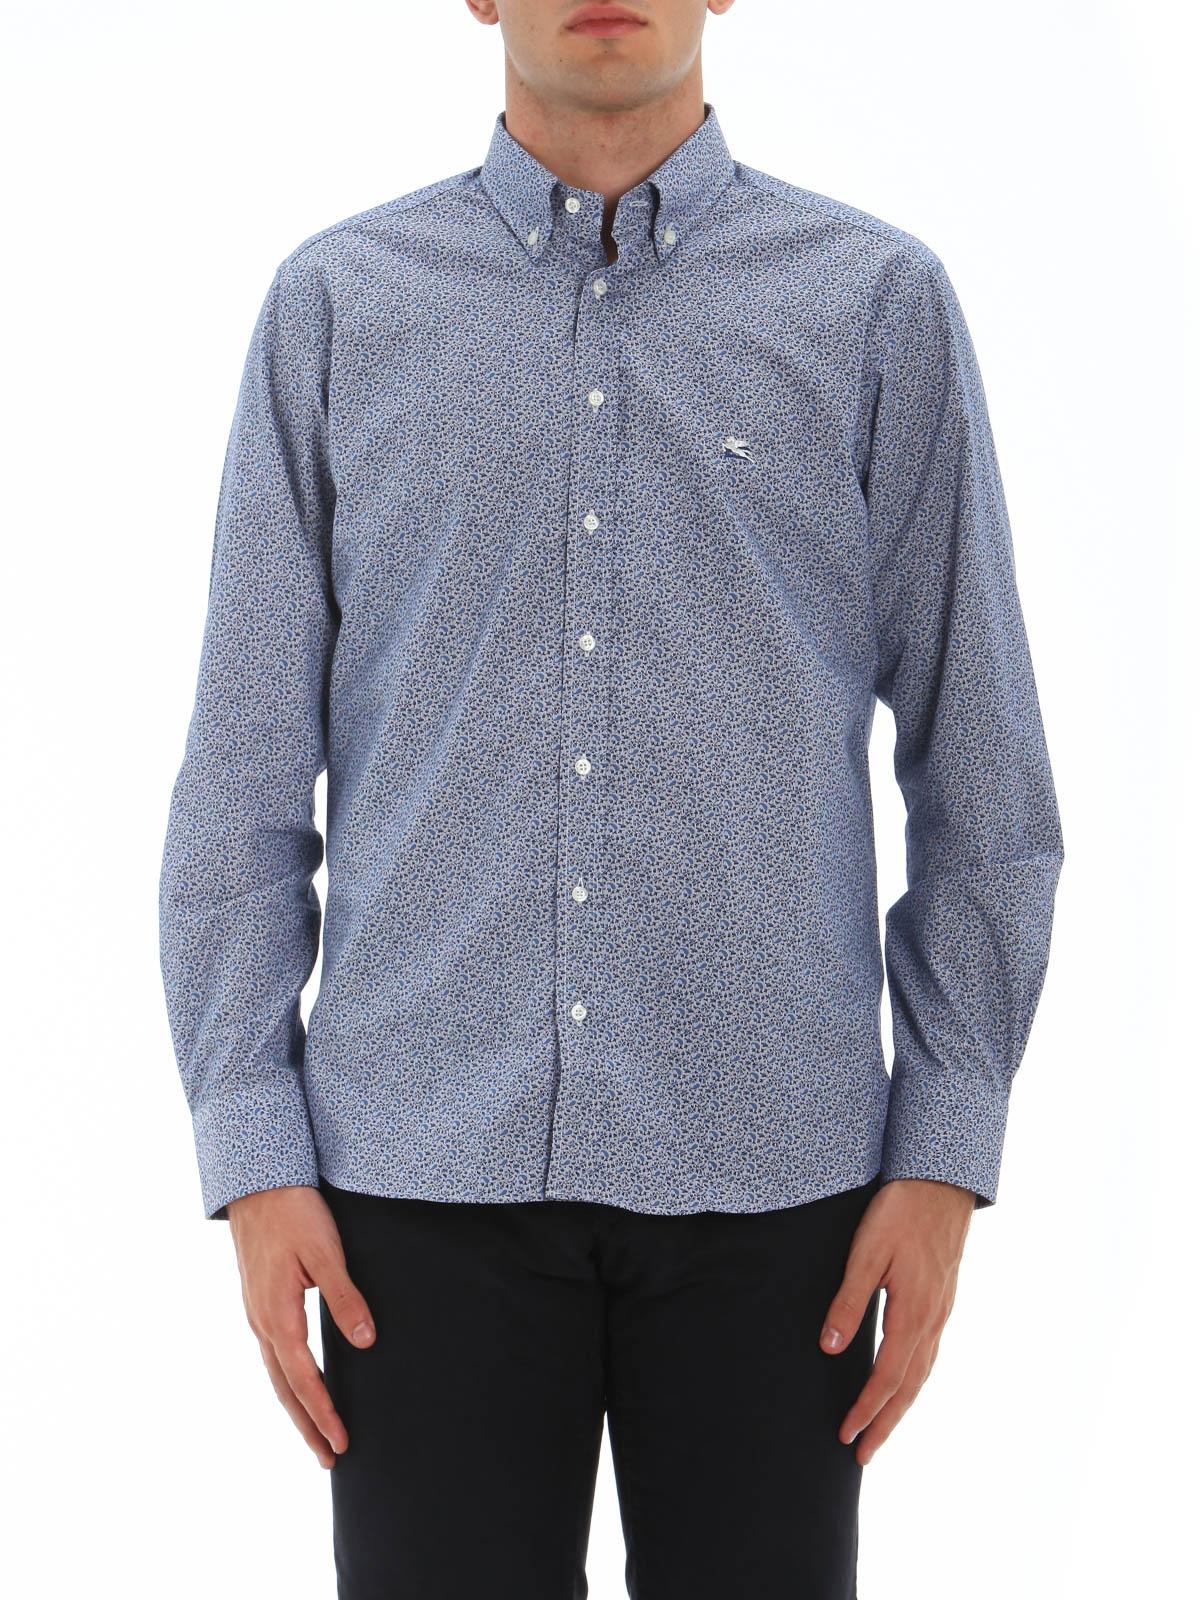 Micro Pattern Button Down Shirt By Etro Shirts Shop